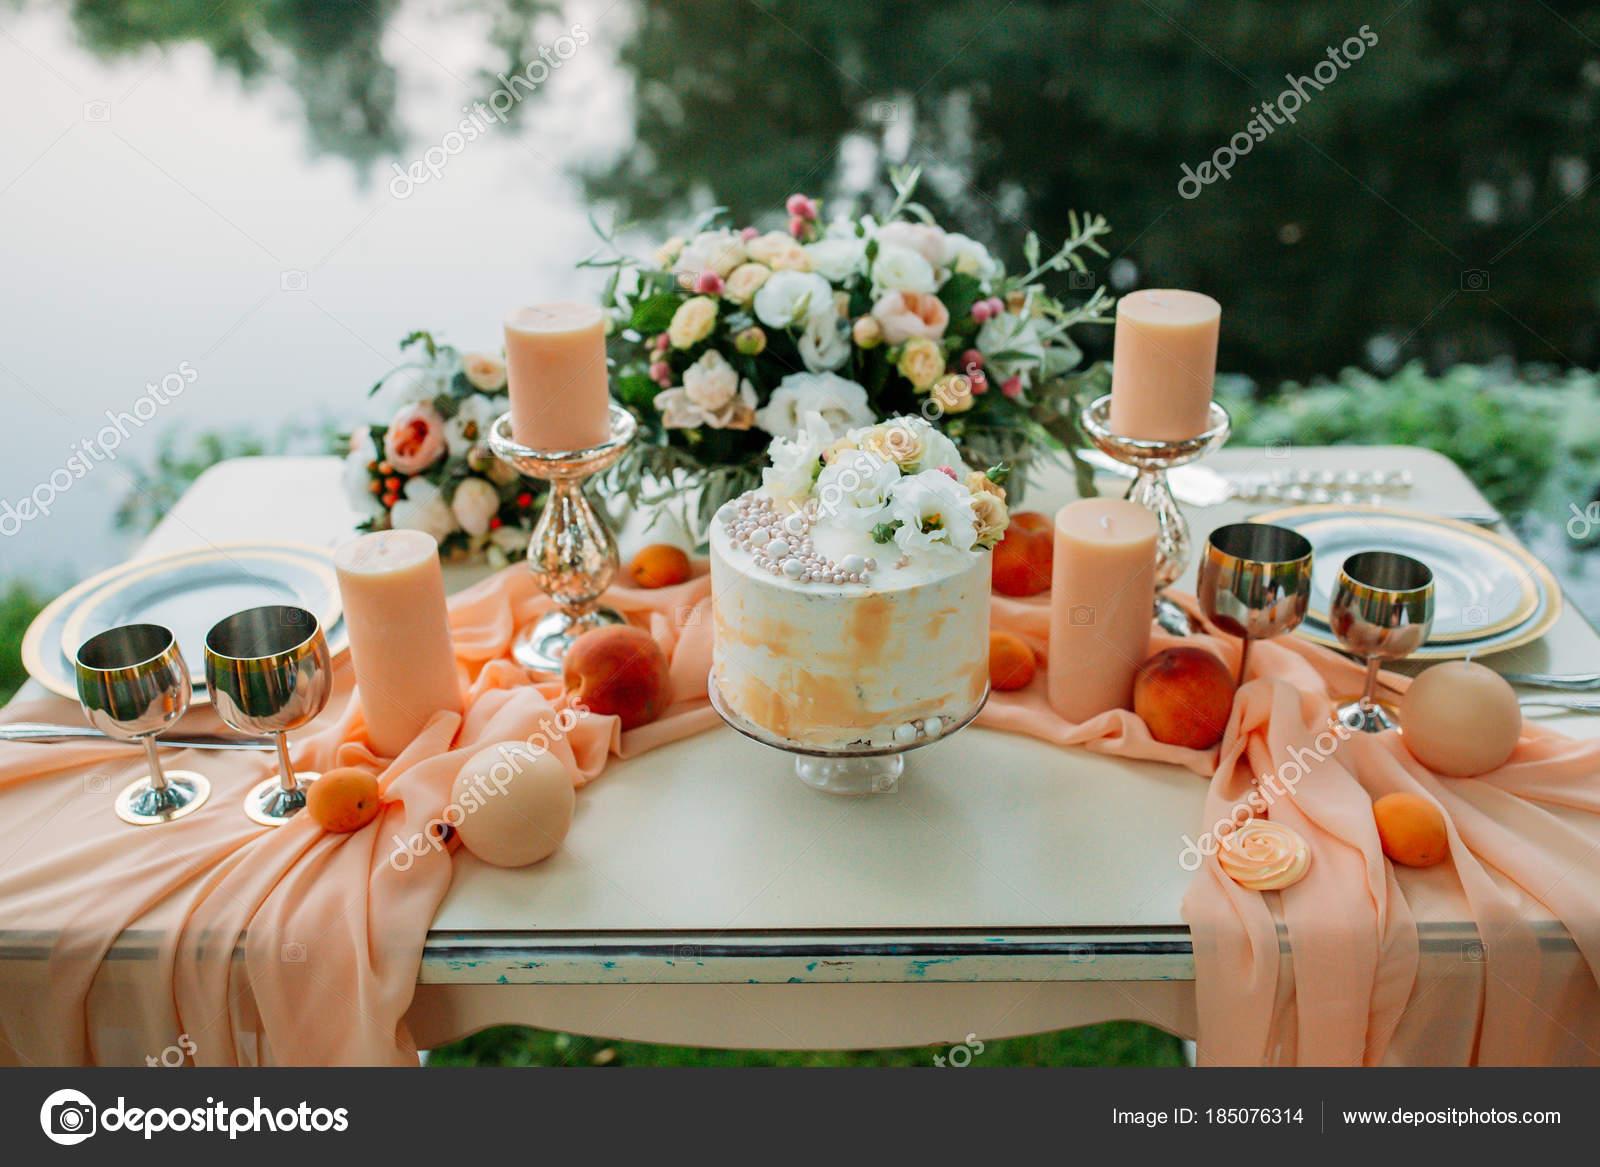 Wedding Table Decoration Romantic Dinner River Stock Photo C Dimadasha 185076314